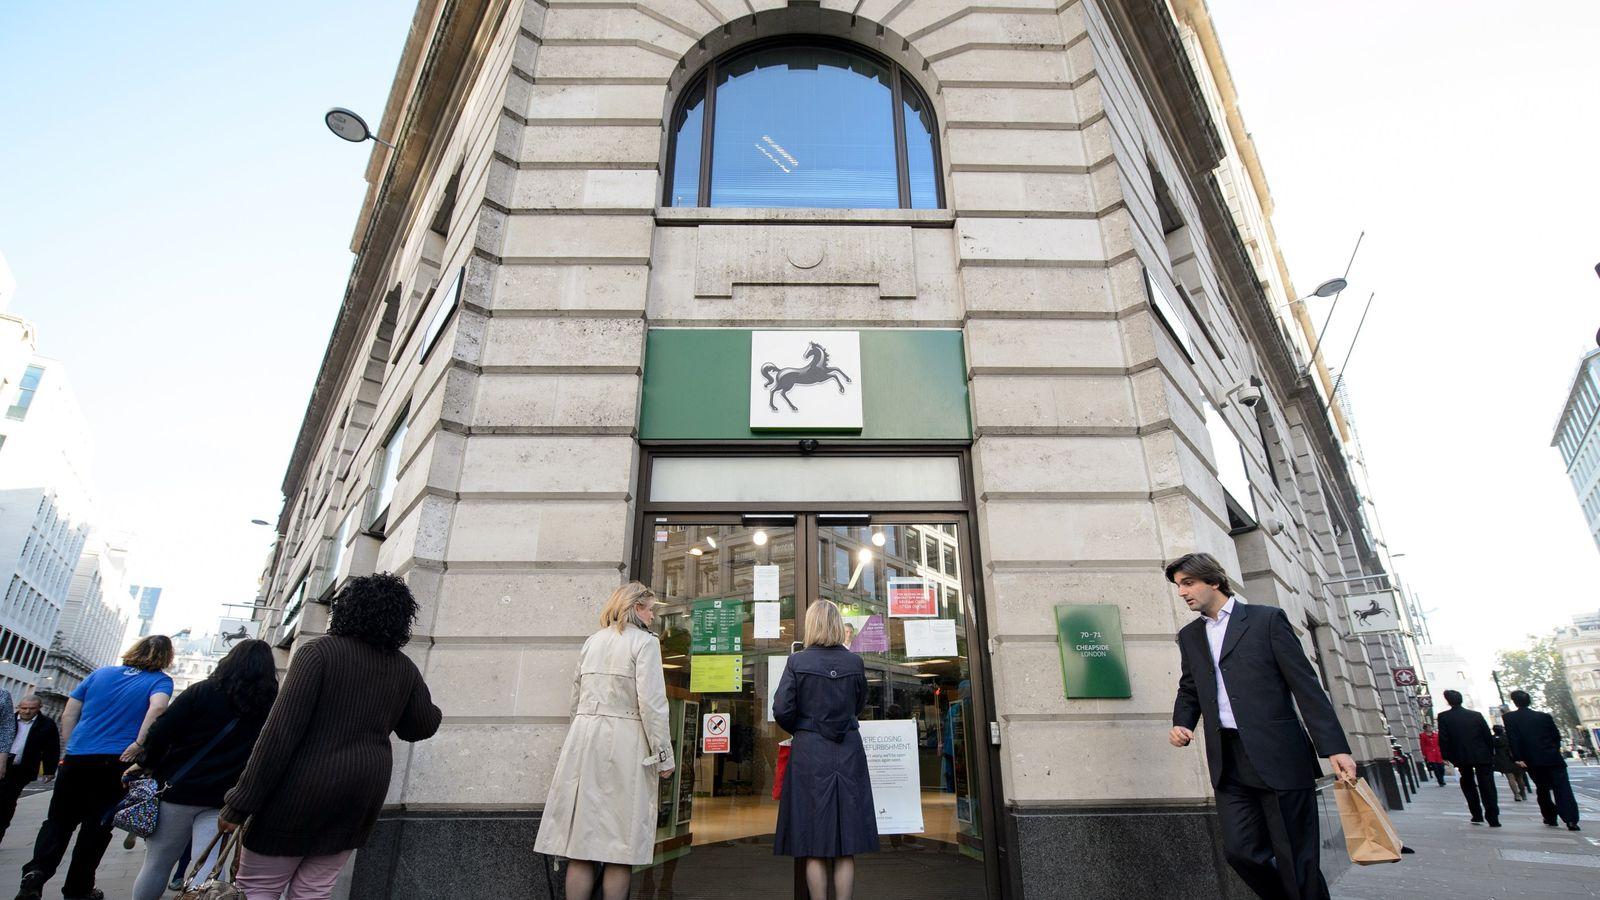 Lloyds shareholders lose legal challenge over HBOS merger